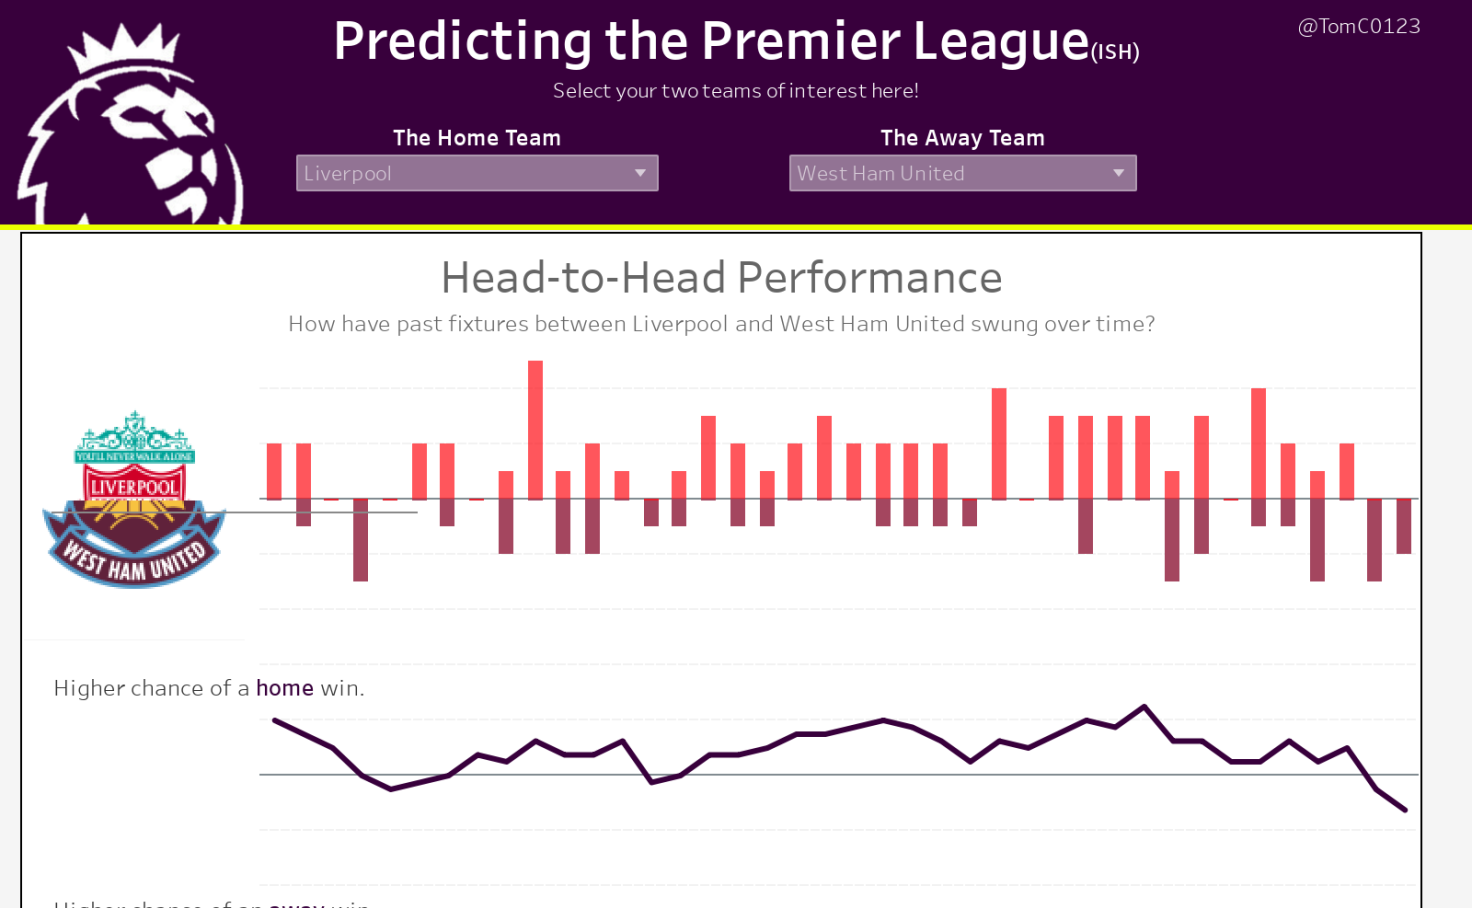 Predicting the Premier League (ish) - Tom Christian